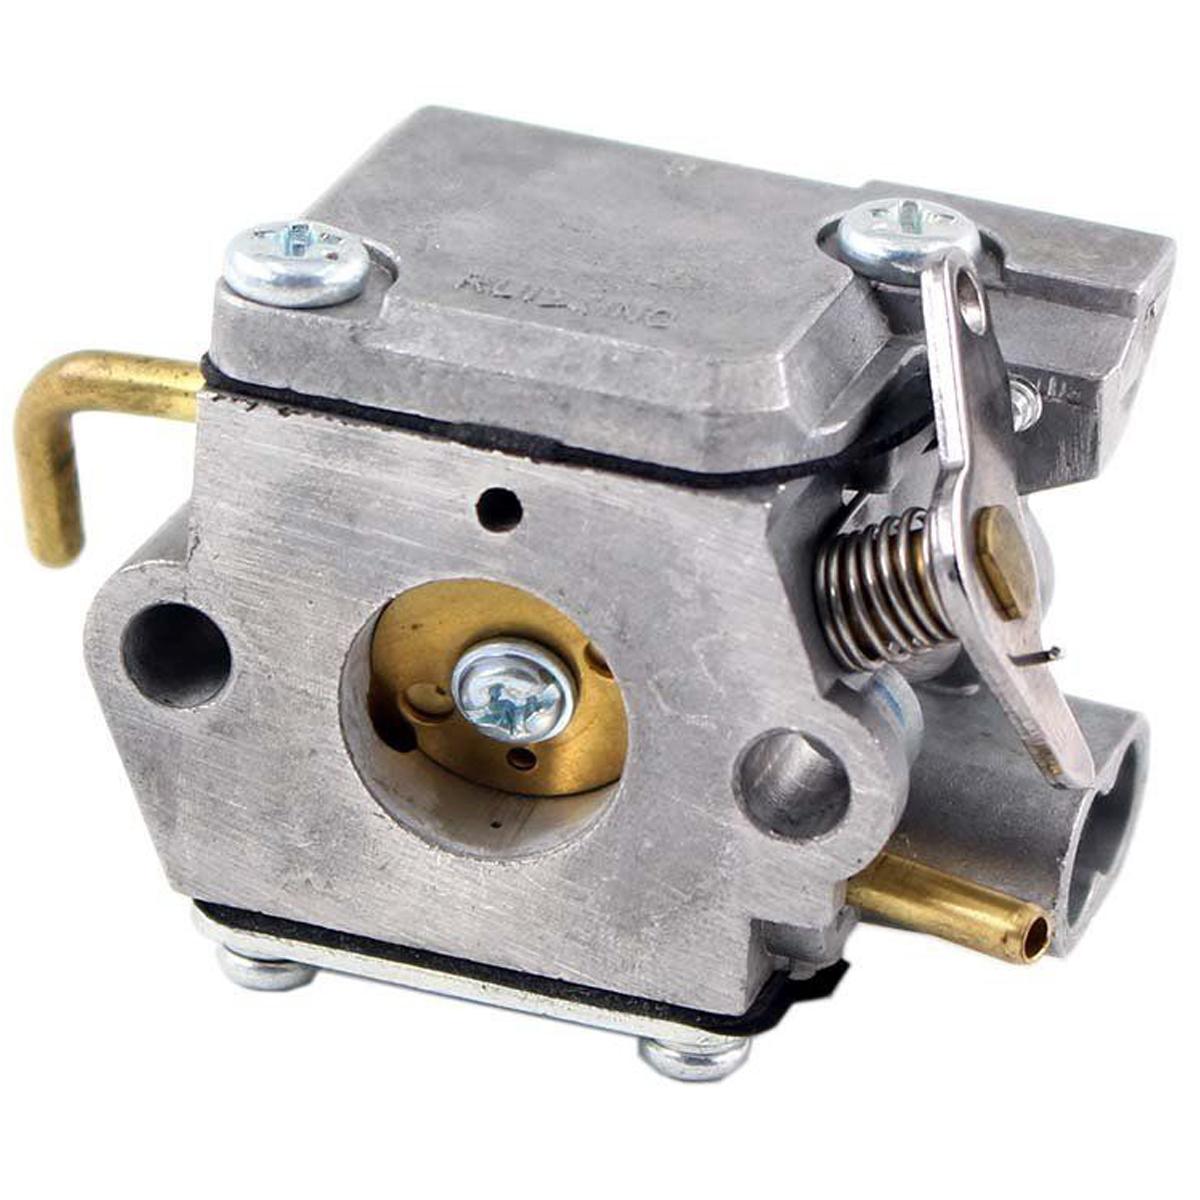 Ryobi 825r Carburetor Rebuild 825ra Parts List And Diagram 41cd825c038 Ereplacementparts Carb Fit Wt 827 1 Ryan